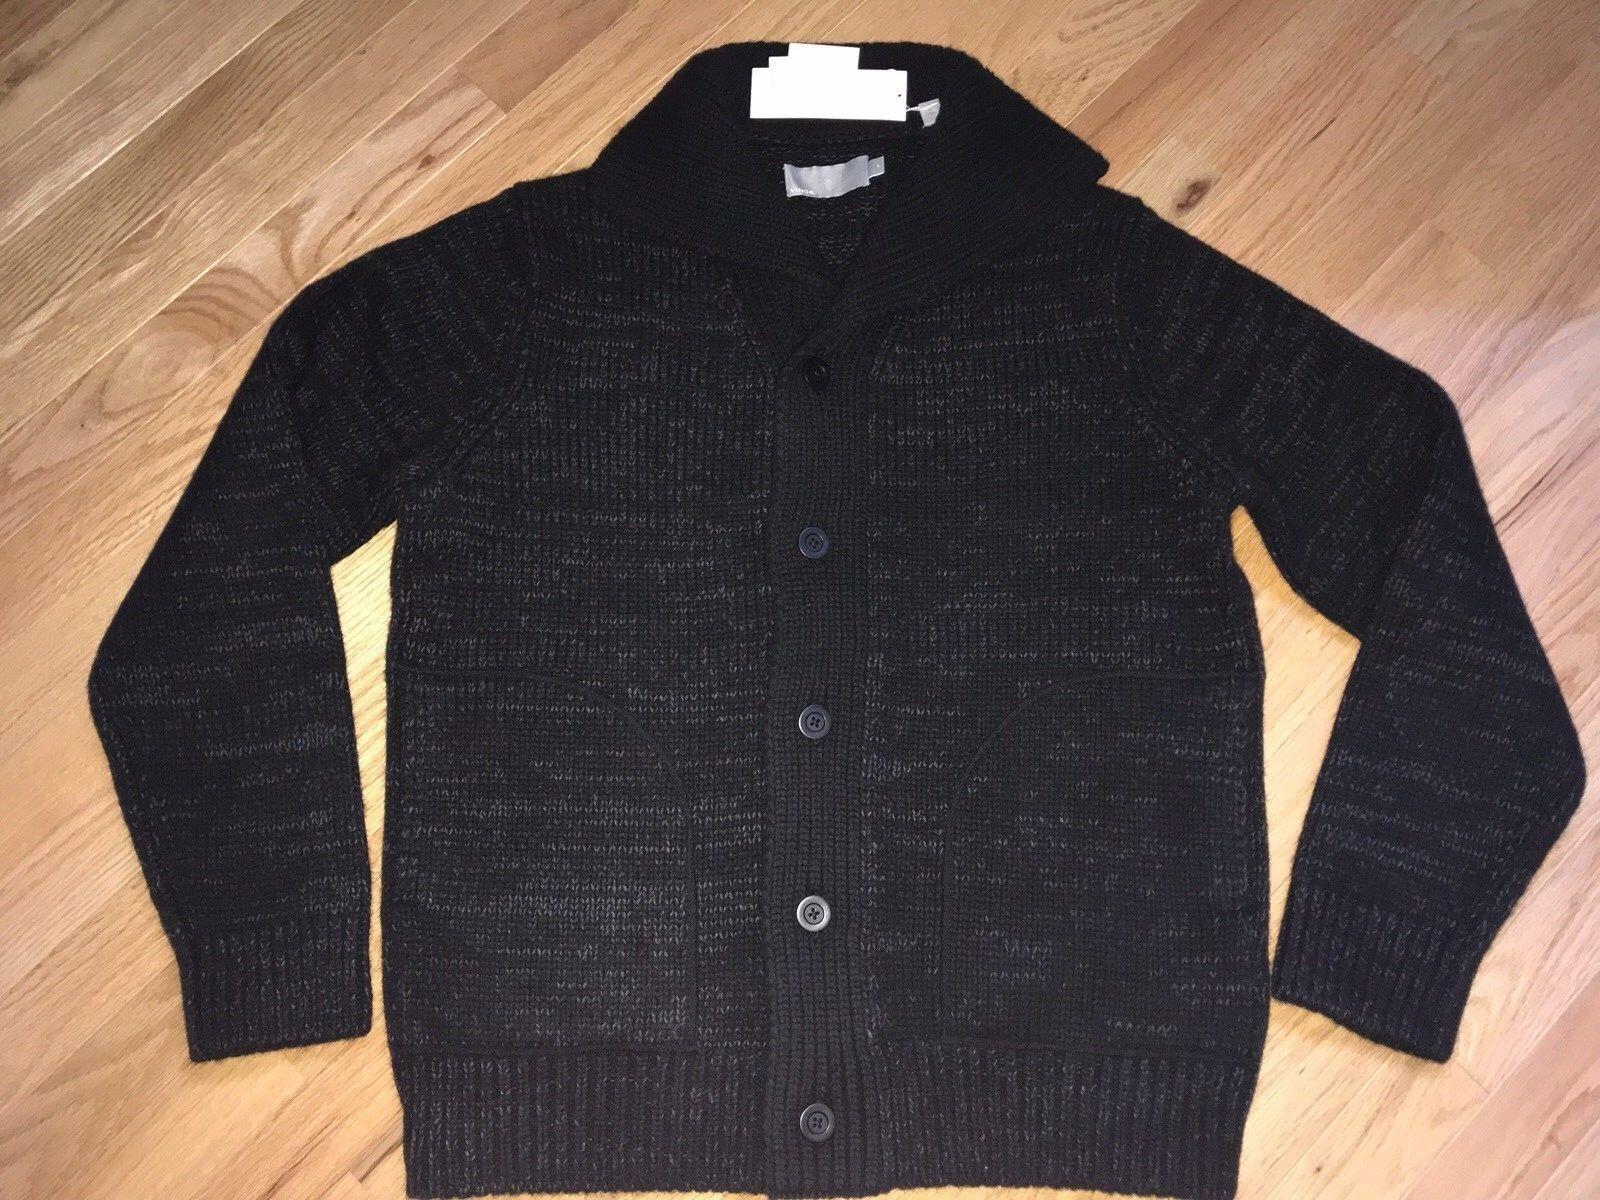 Nwt 425 VINCE. Sweater sz M